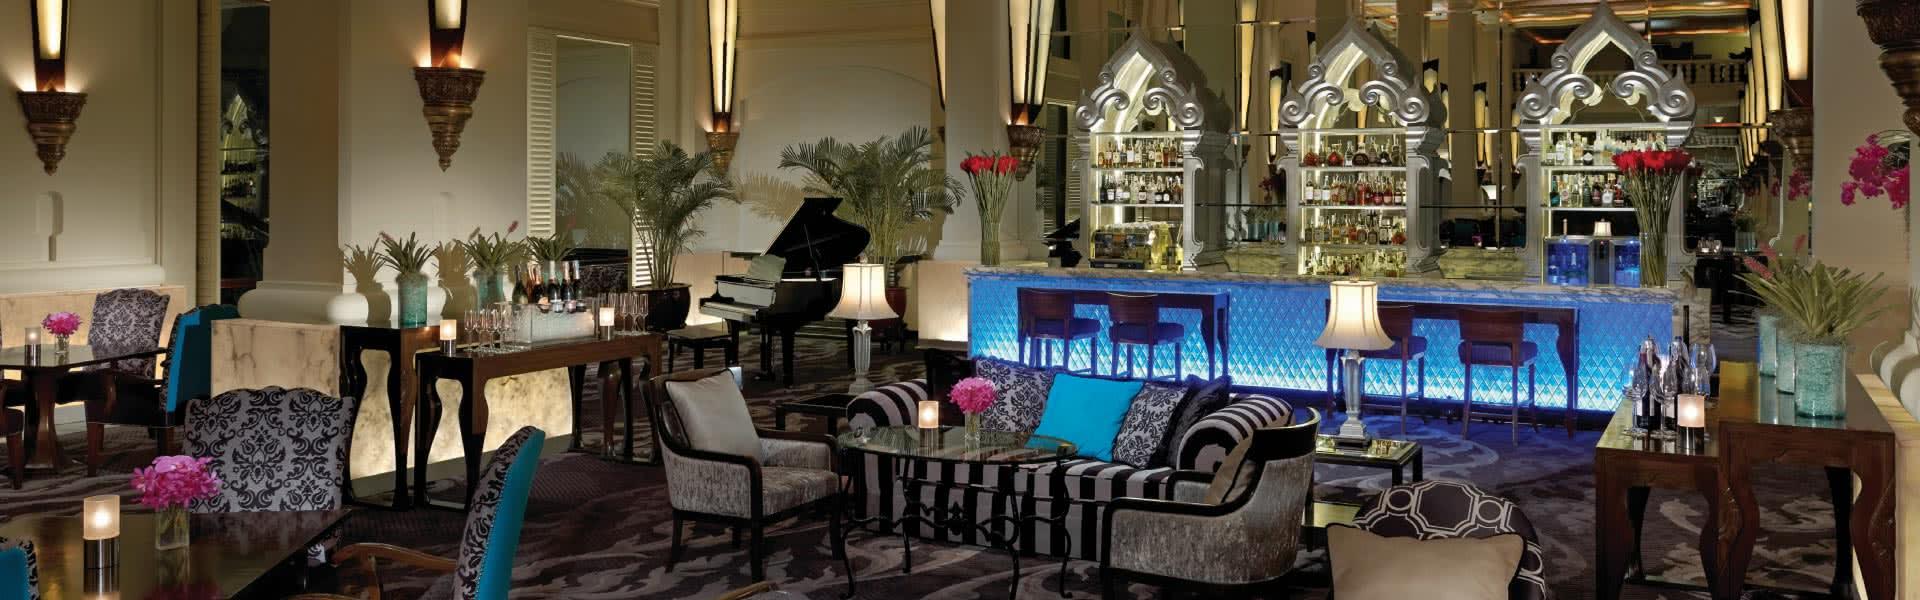 Best Hotel Bars Bangkok Anantara Siam Happy Hour At Aqua Bar